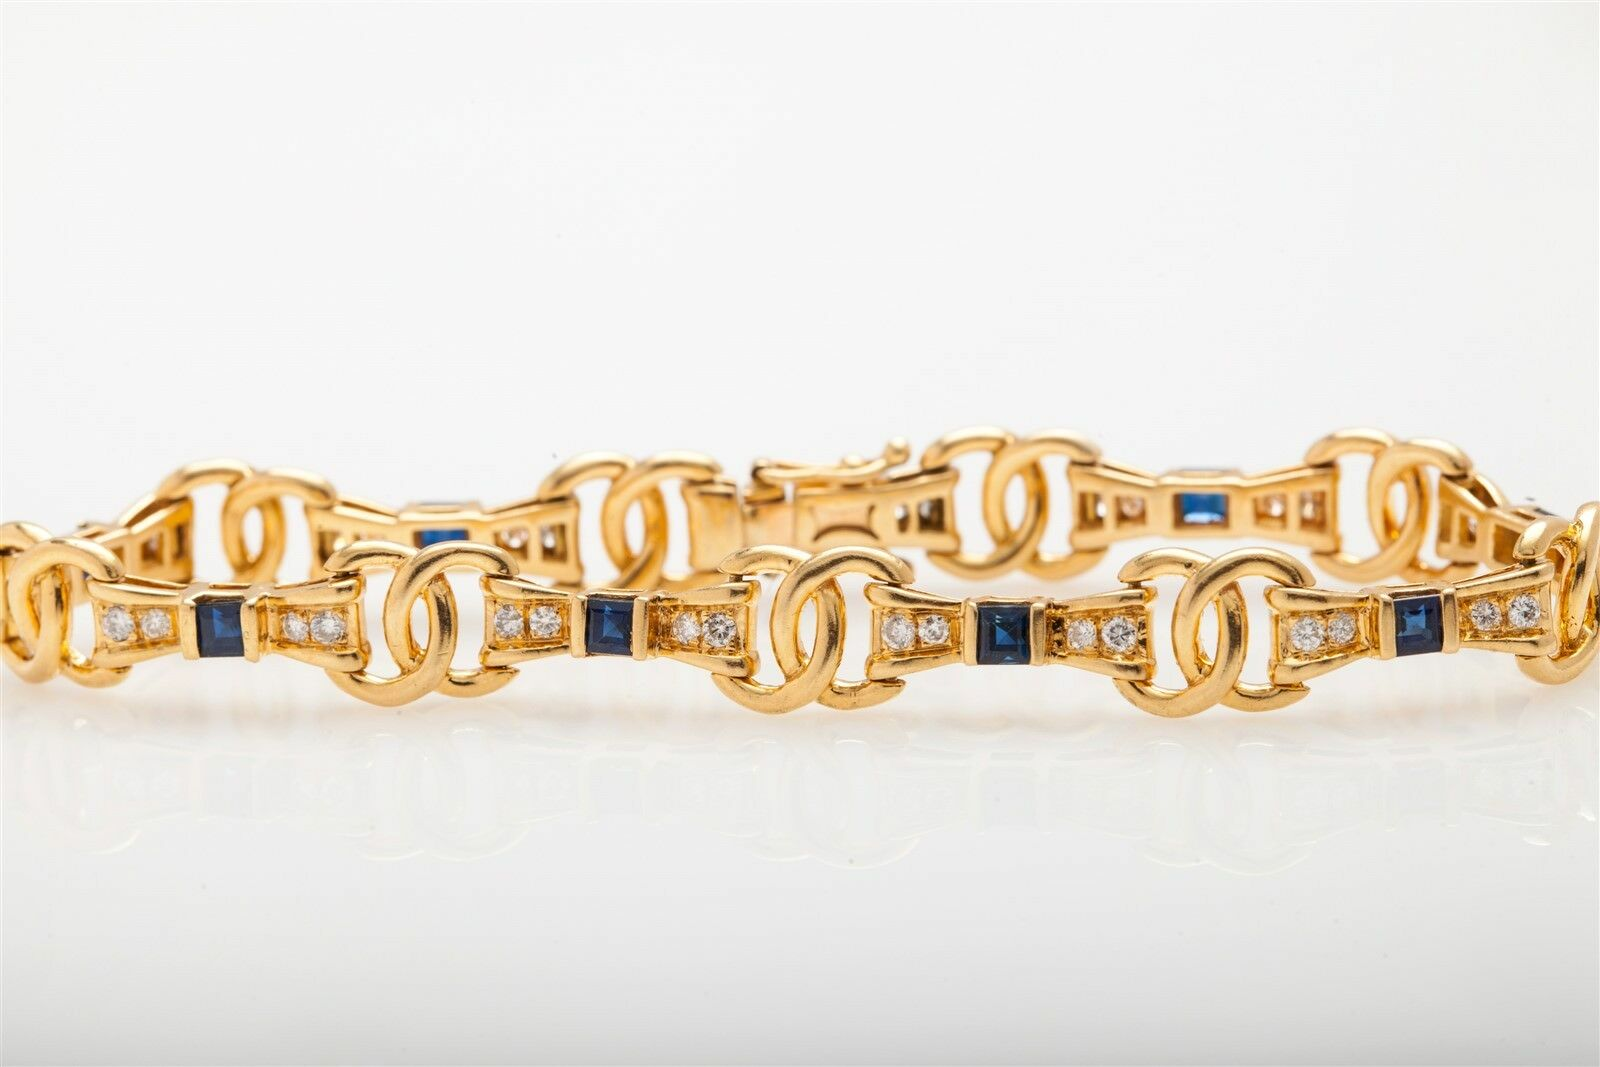 Designer C INITIAL FANCY LINK  7000 3ct bluee Sapphire Diamond 14k gold Bracelet